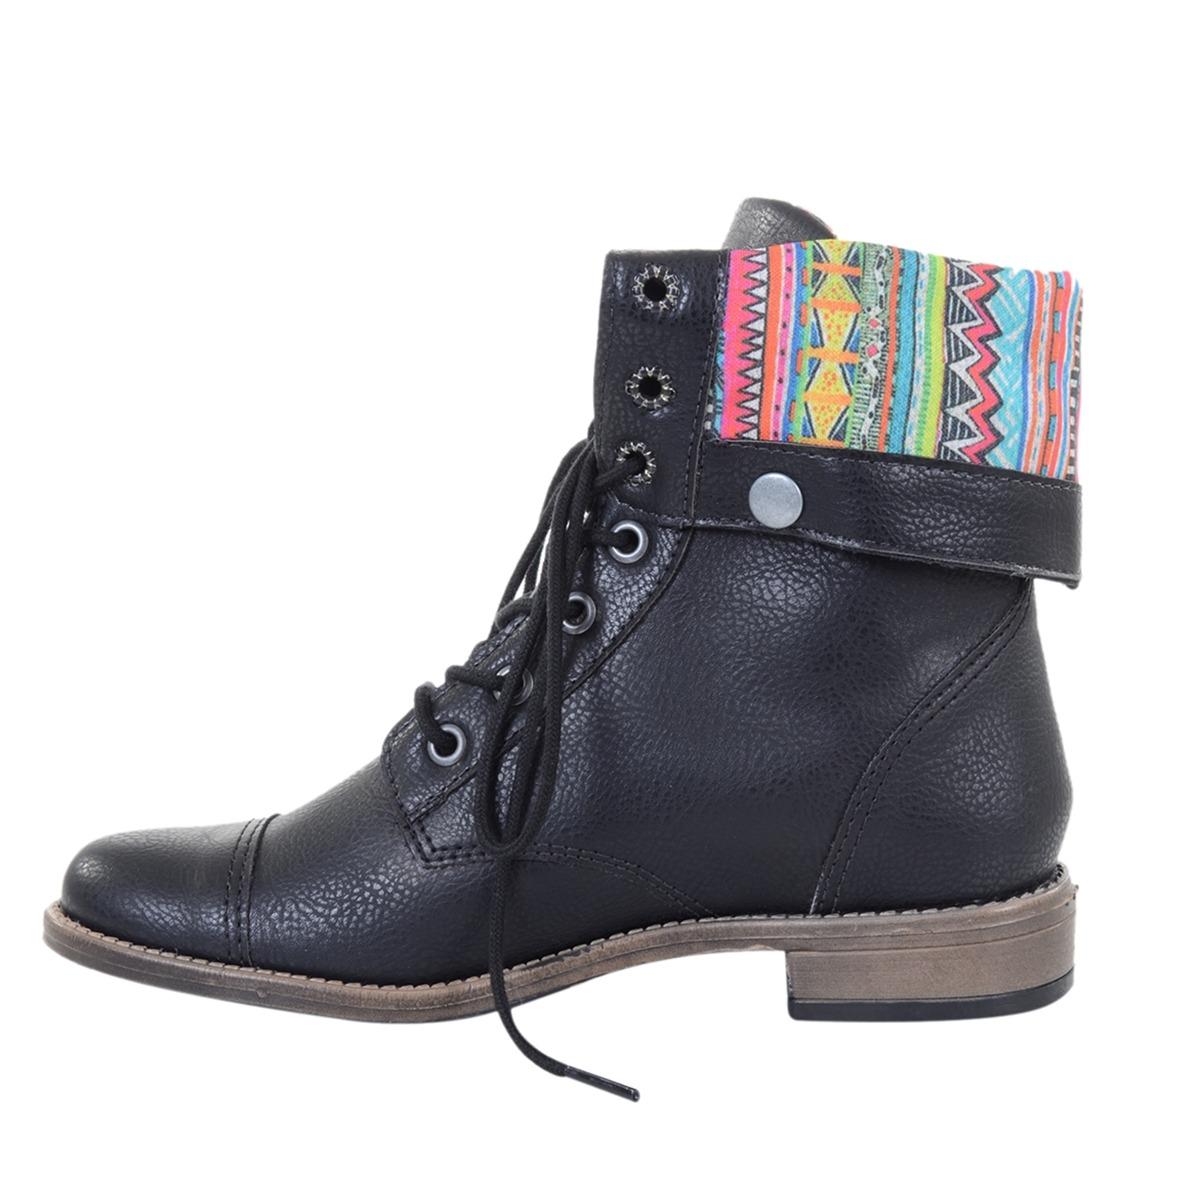 202a79c81c1 bota feminina luilui looza black. Carregando zoom.